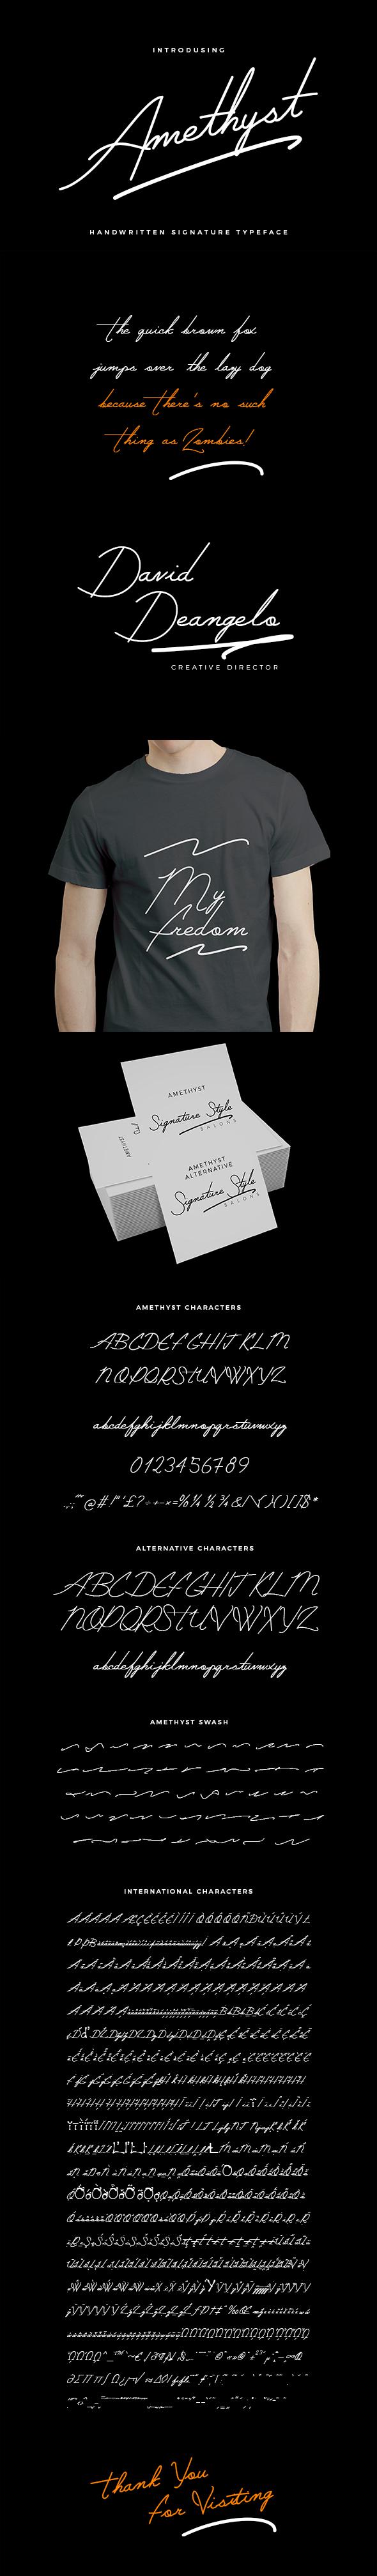 Amethyst Signature Typeface - Hand-writing Script